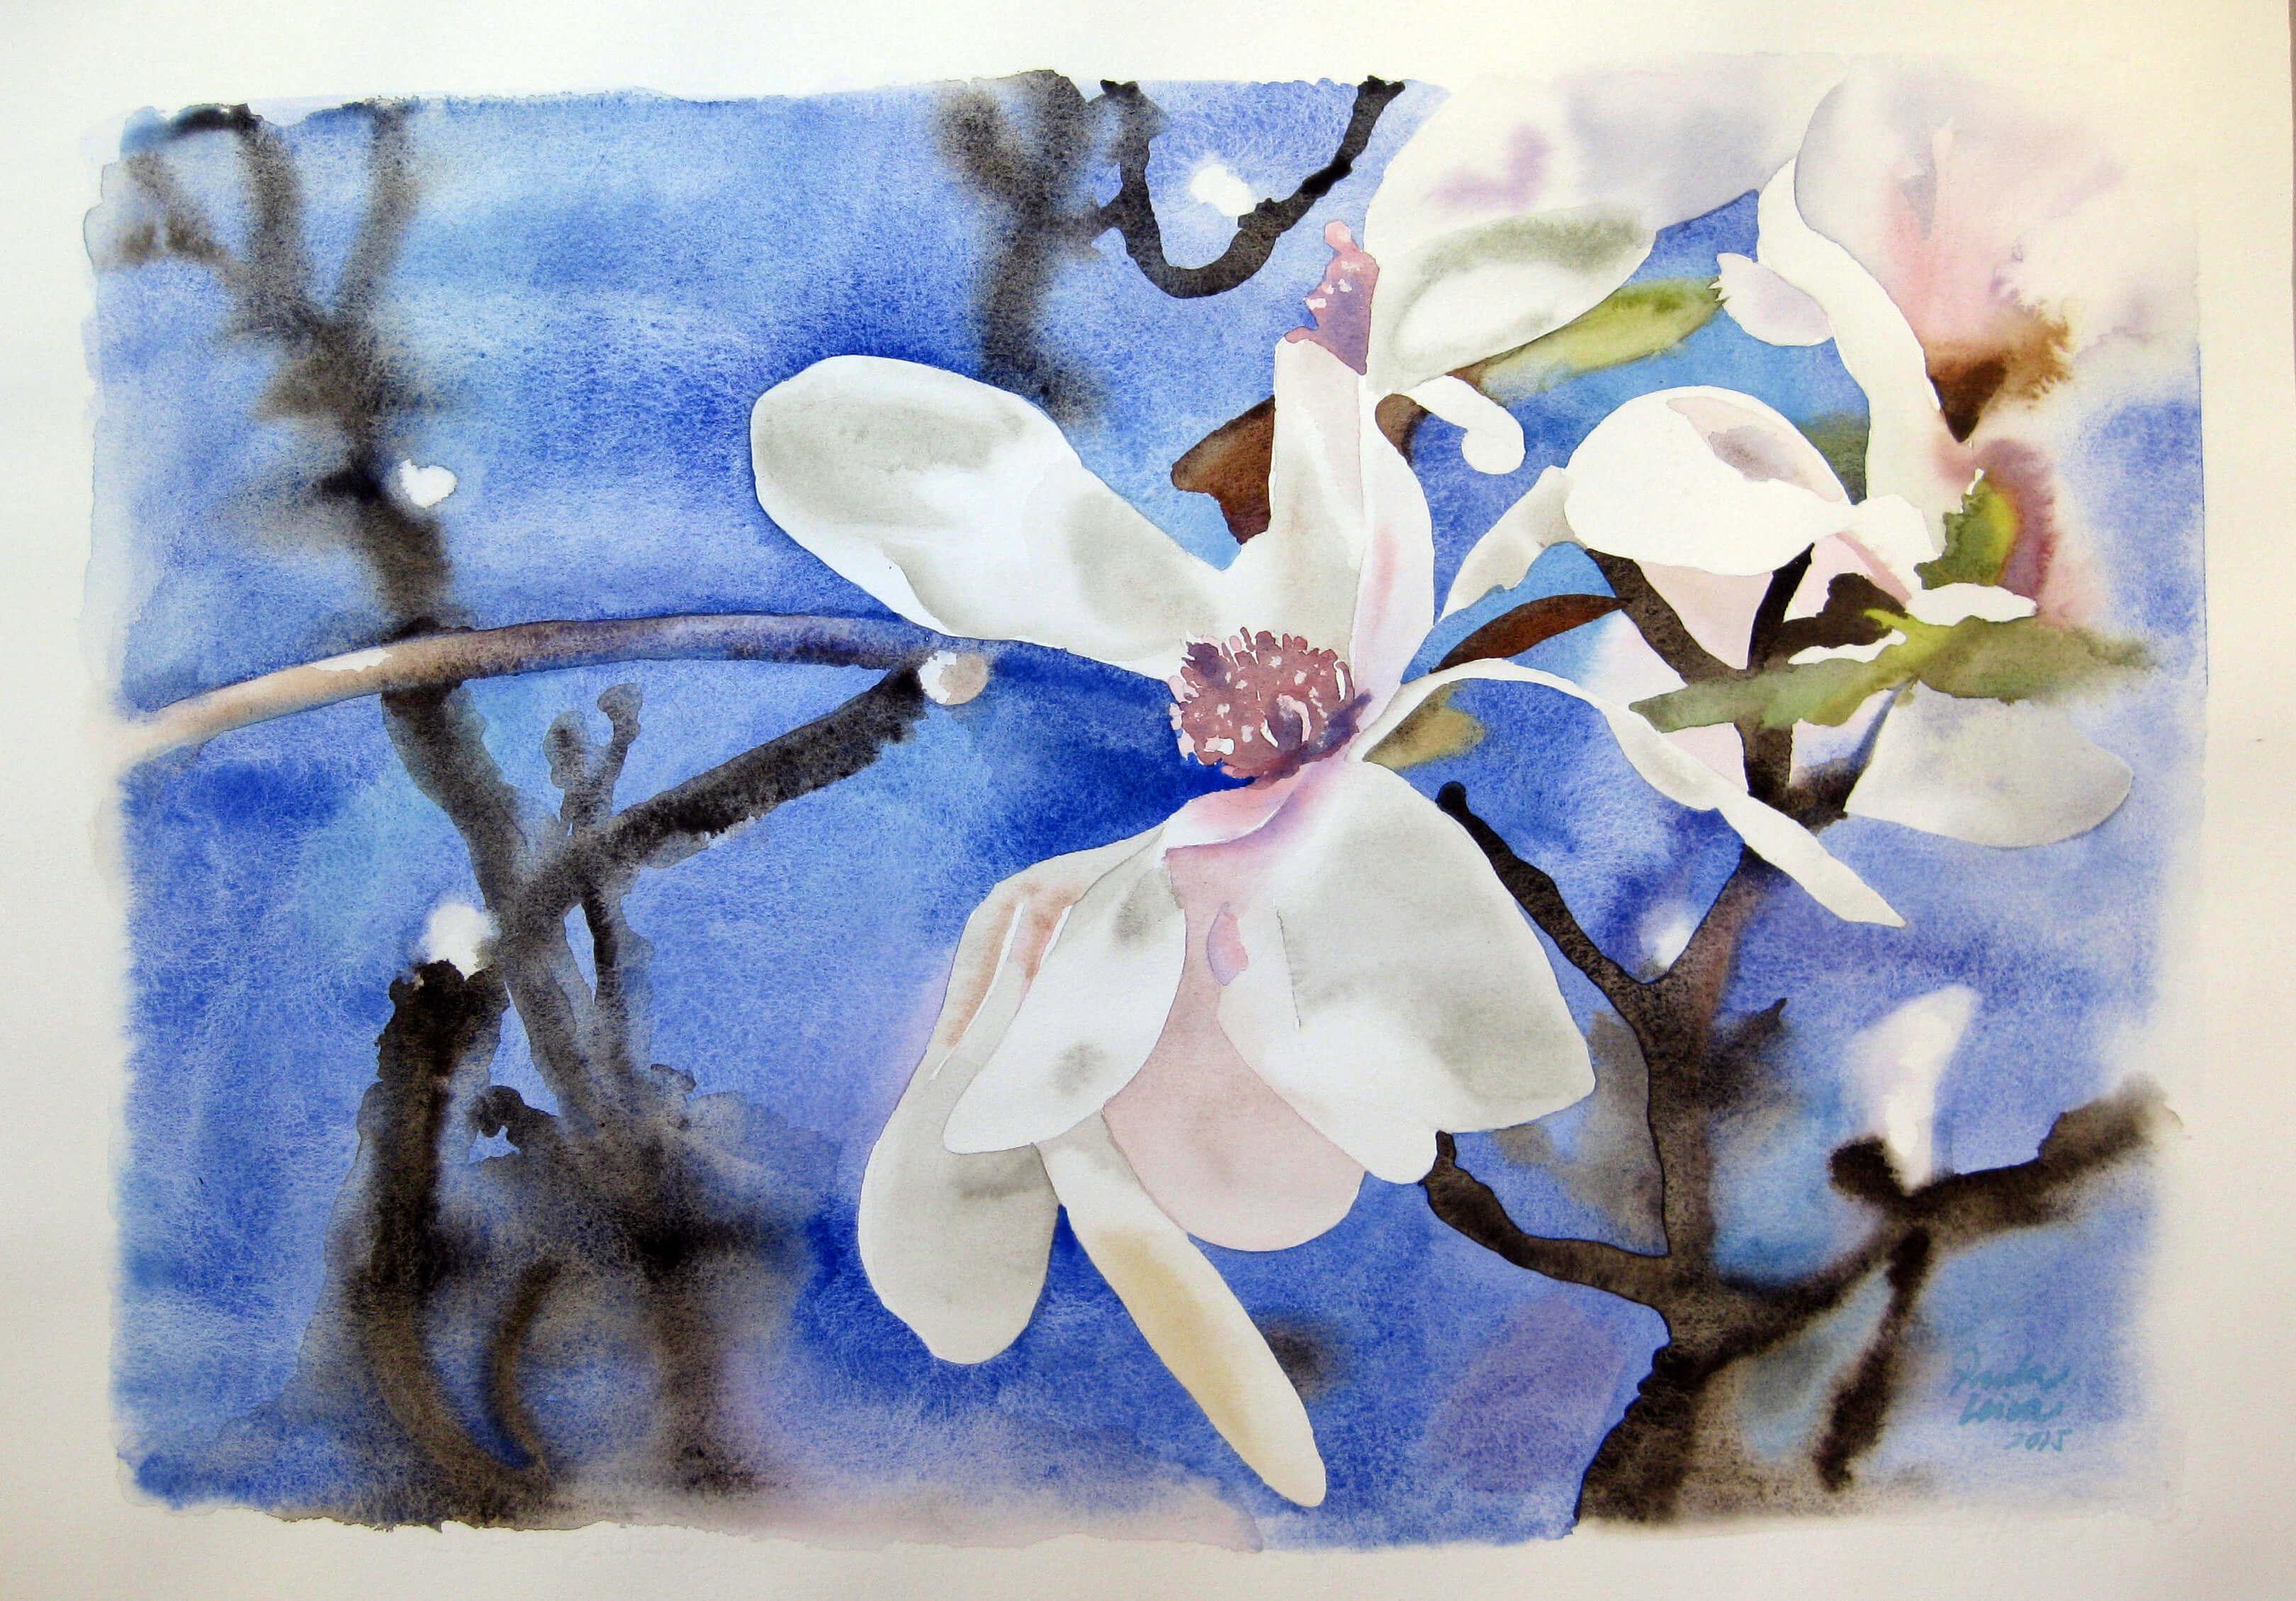 Magnolia-2015-Aquarel.la-50-x-70-cms Paula Leiva